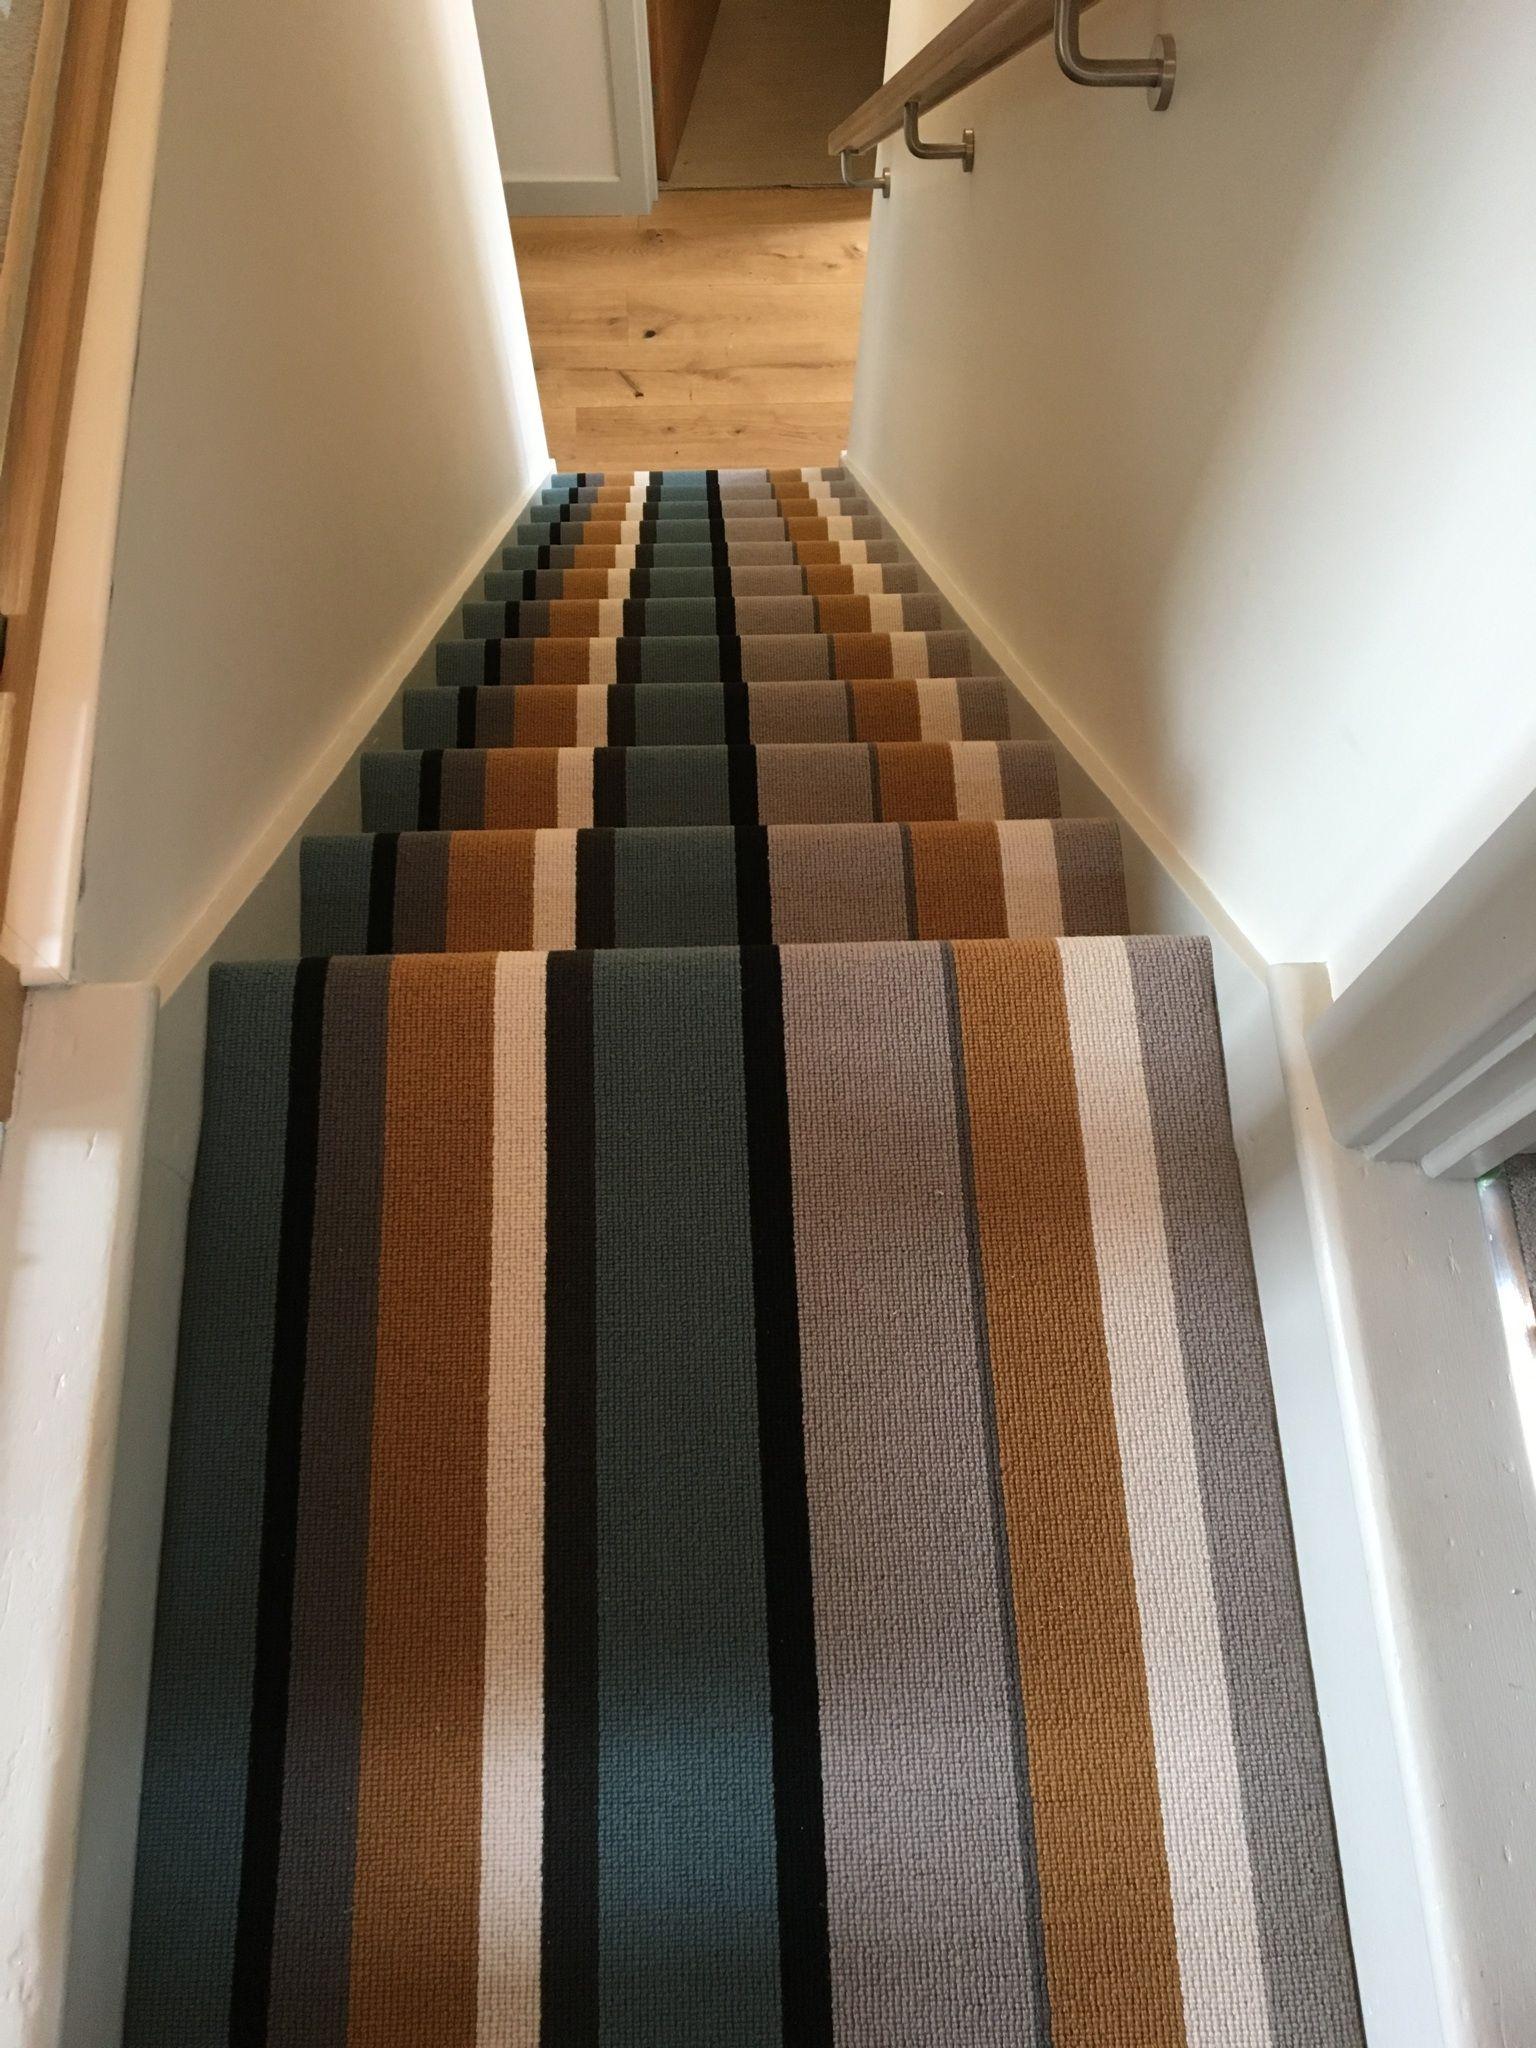 Bespoke Carpet Runners Created By Ben Champness For Higherground Camberley Higherground Co Uk Contemporary Rug Home Decor Carpet Runner